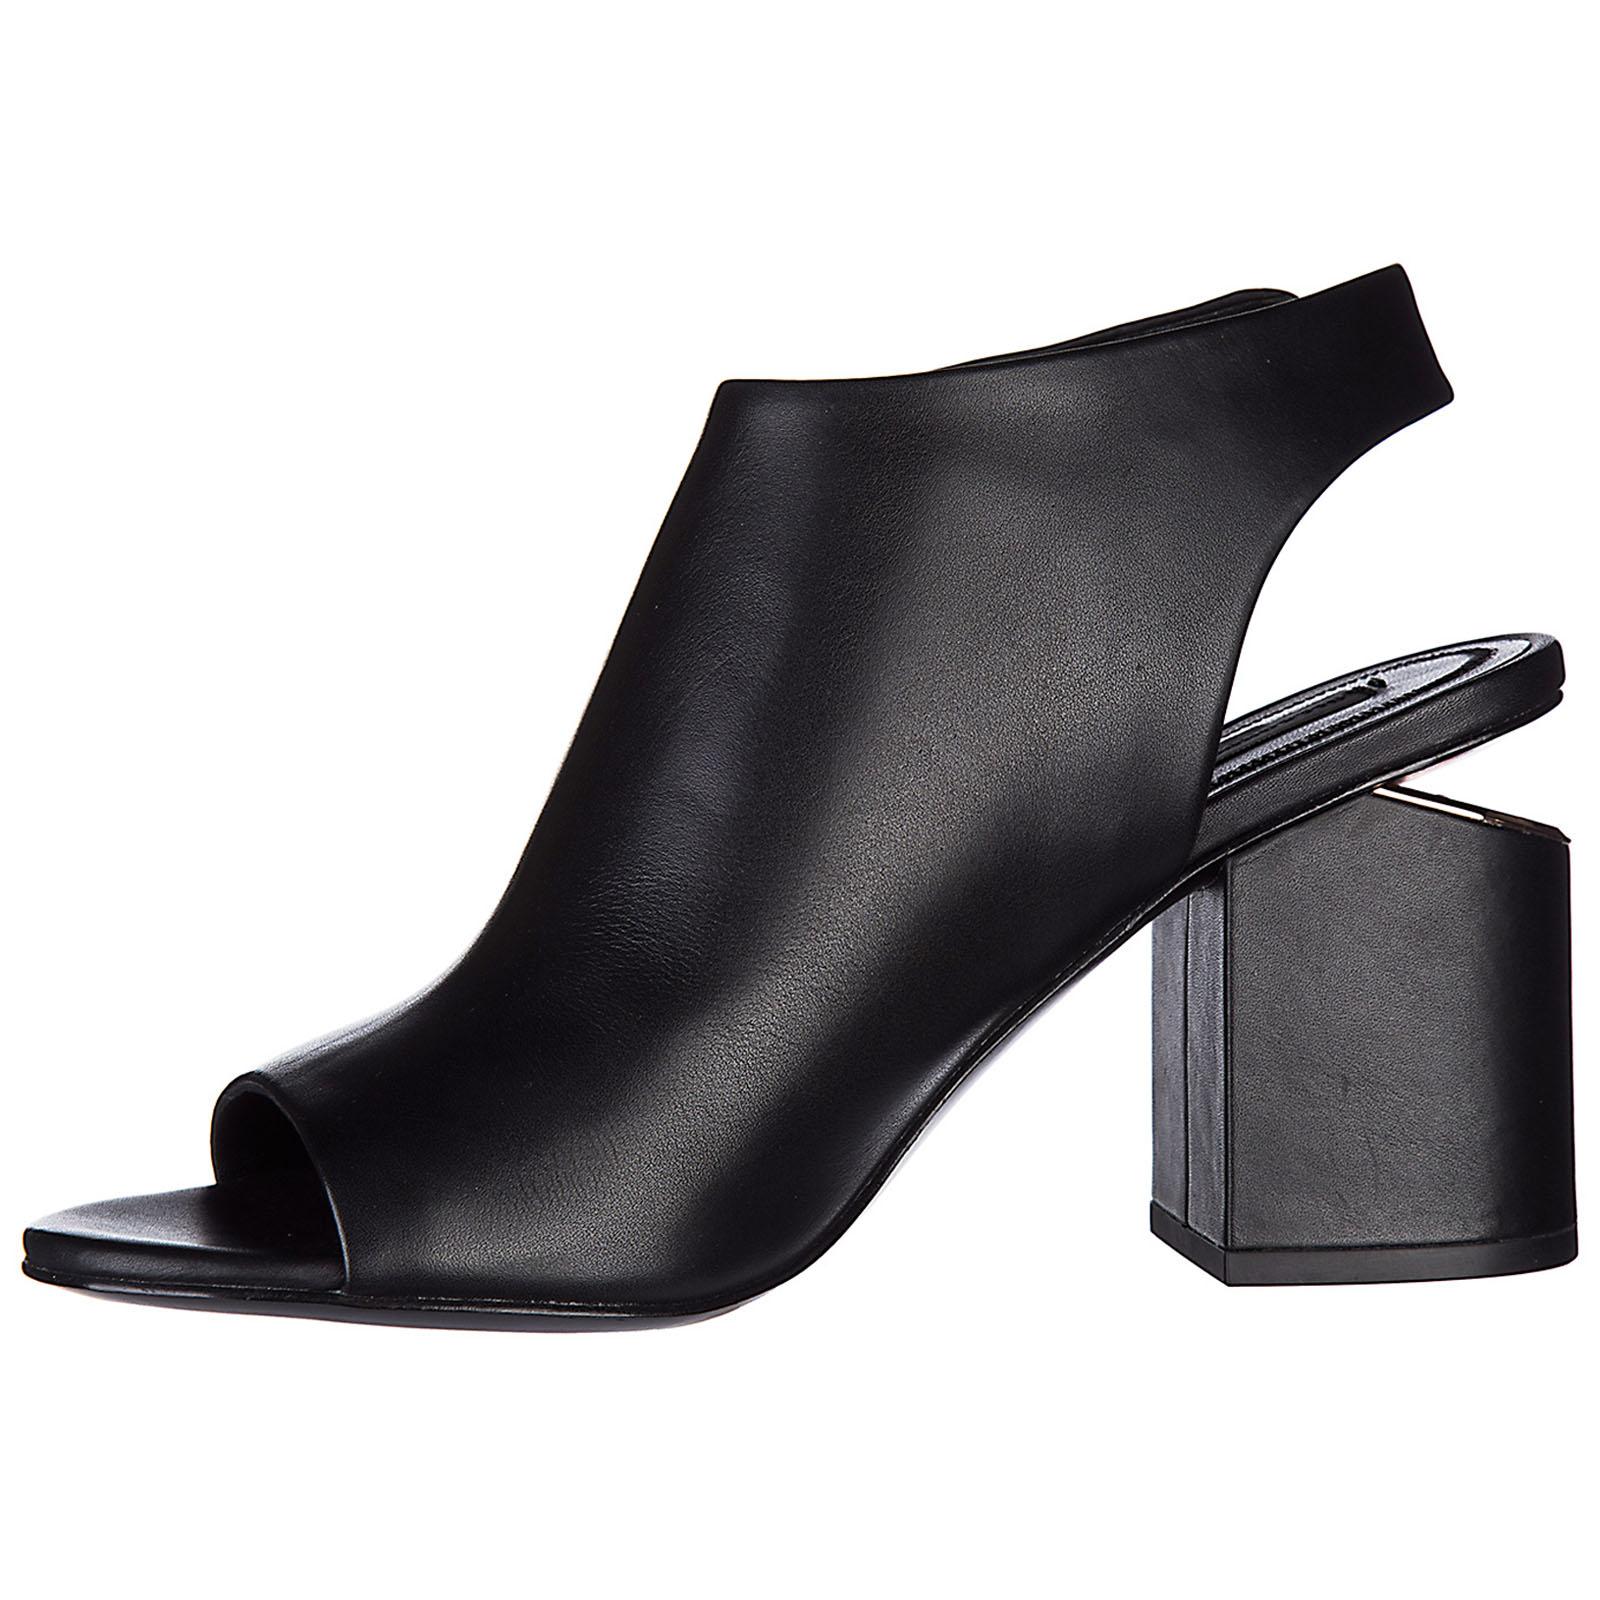 сандалии женские на каблуке кожаные nadia